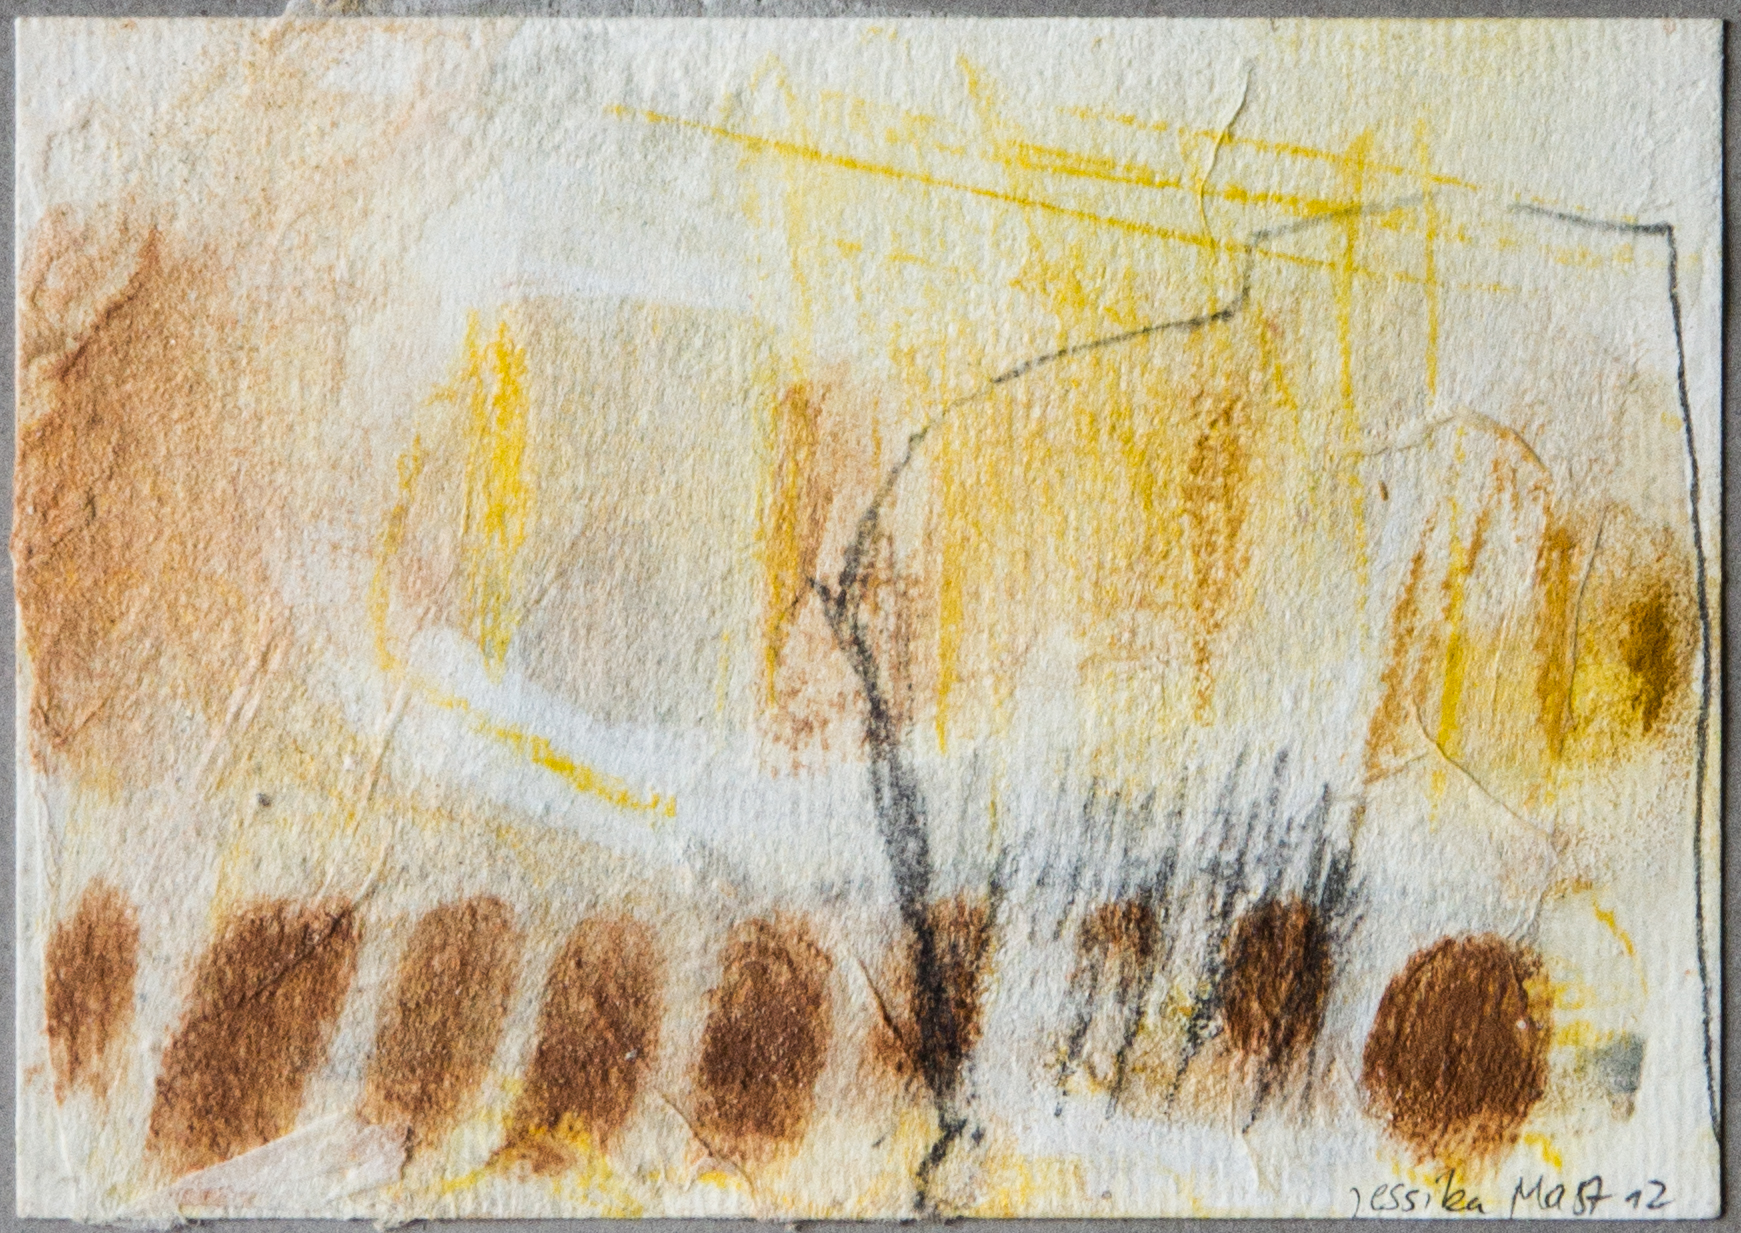 Land 1: 15x20,Acryl, Gesteinsmehle, Kreide, Bleistift auf Papier,2012